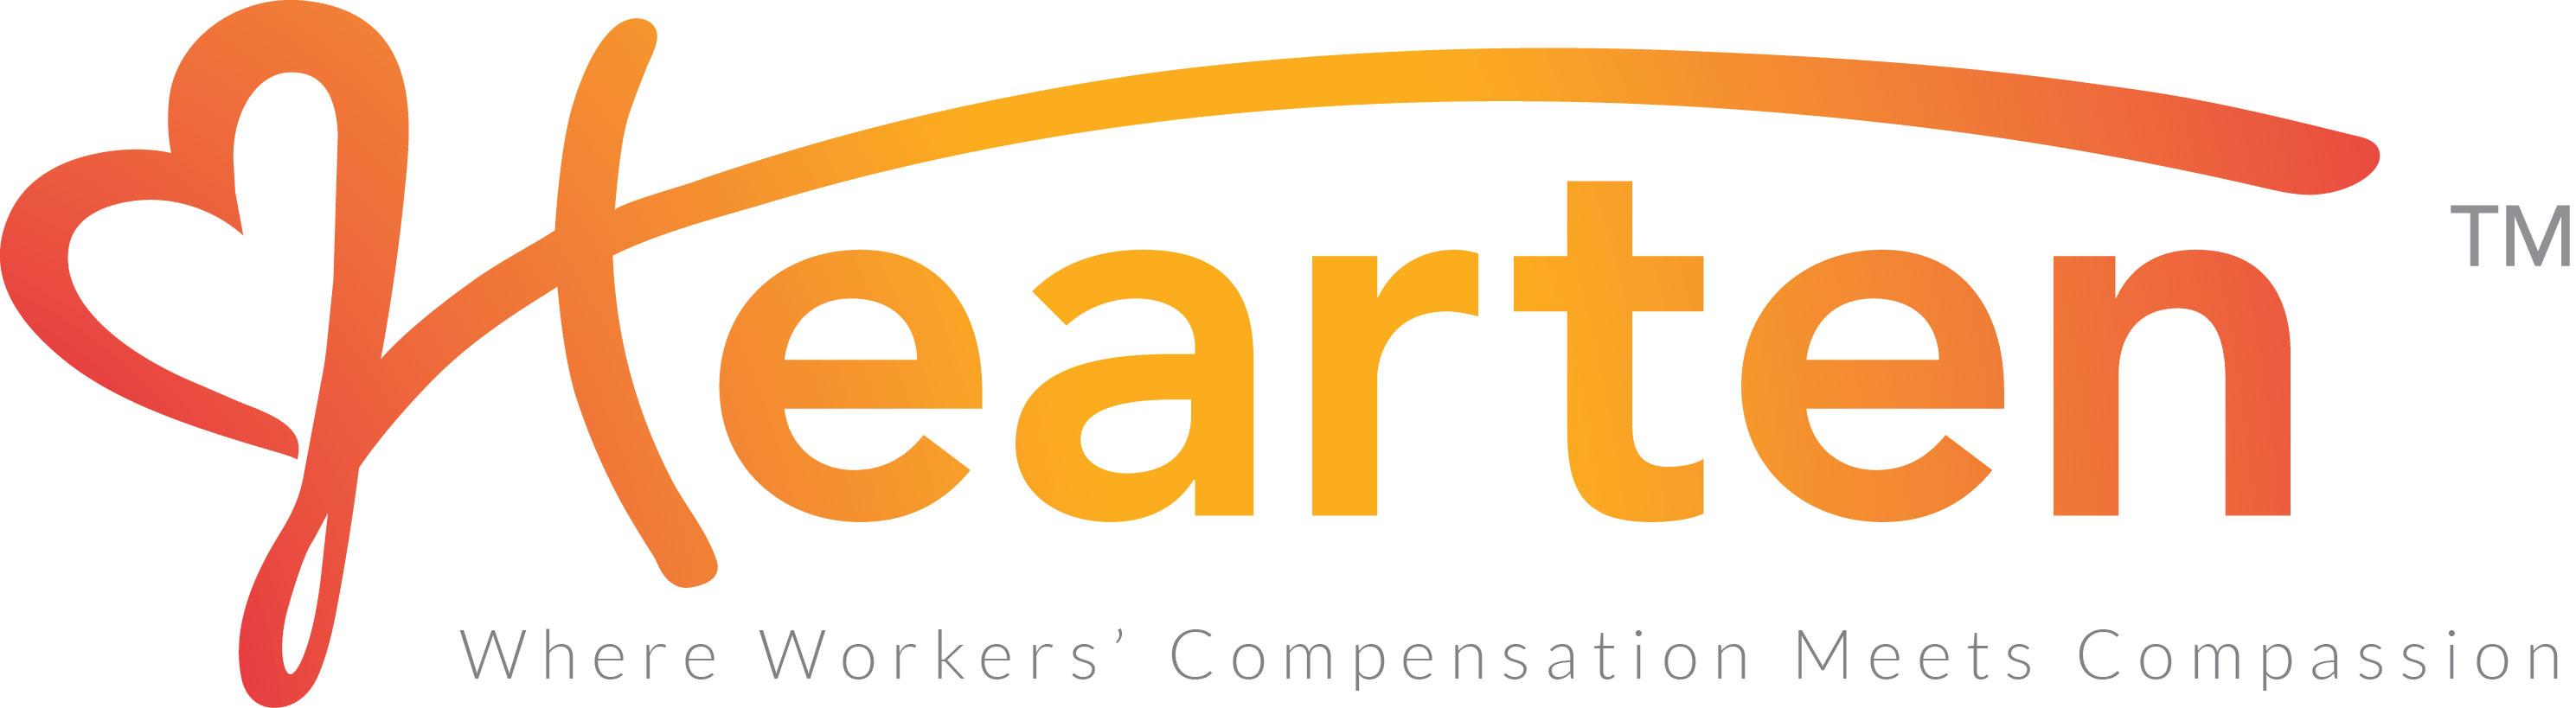 Final Hearten Logo